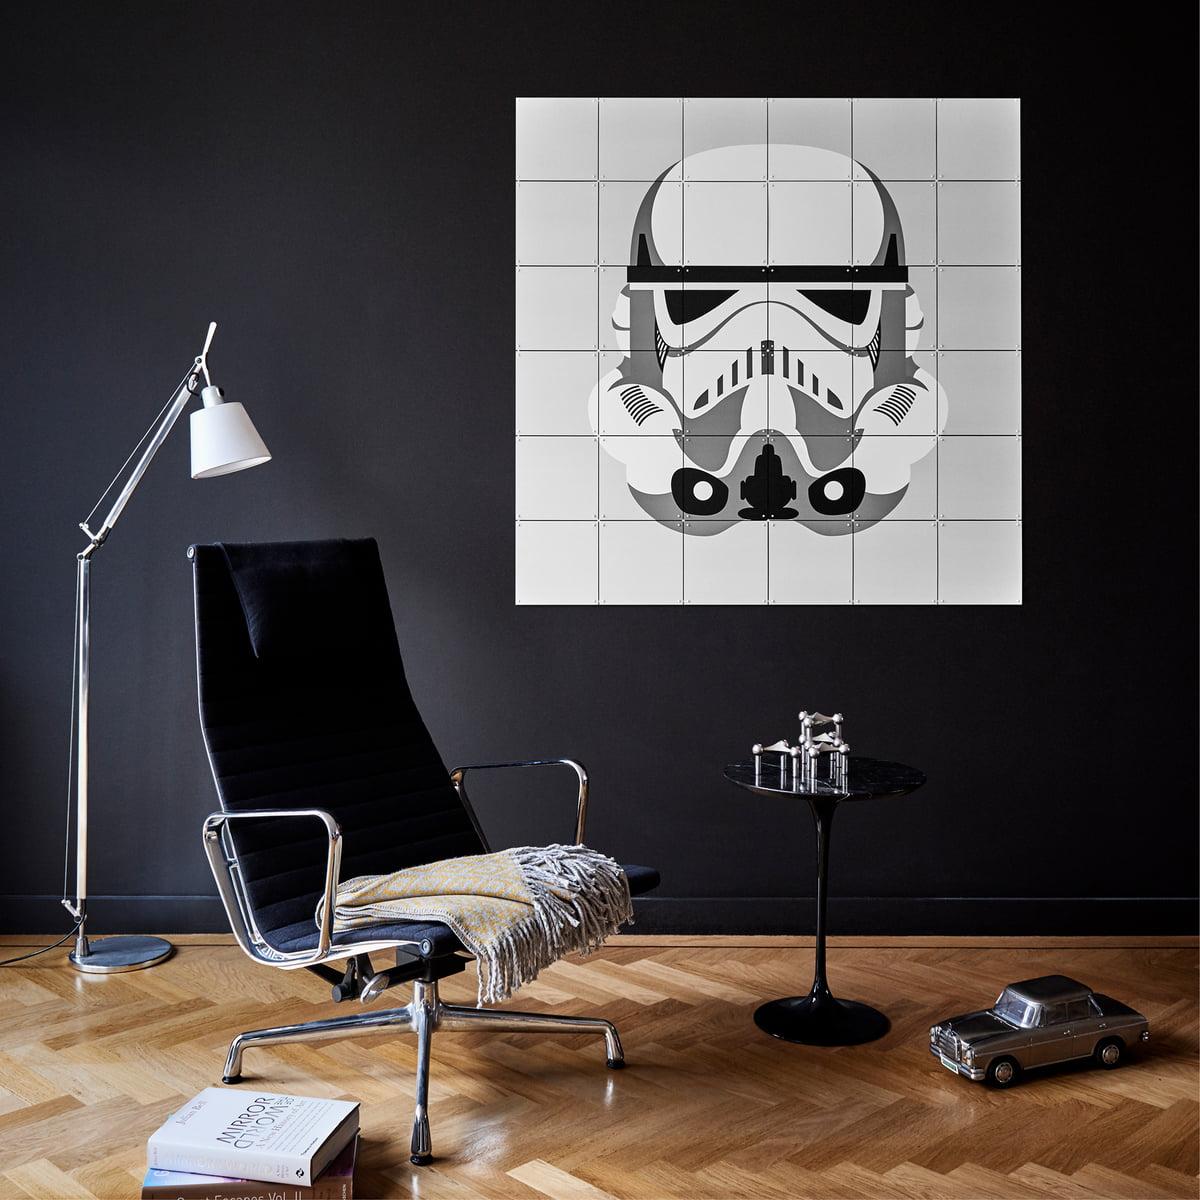 stormtrooper darth vader by ixxi connox. Black Bedroom Furniture Sets. Home Design Ideas